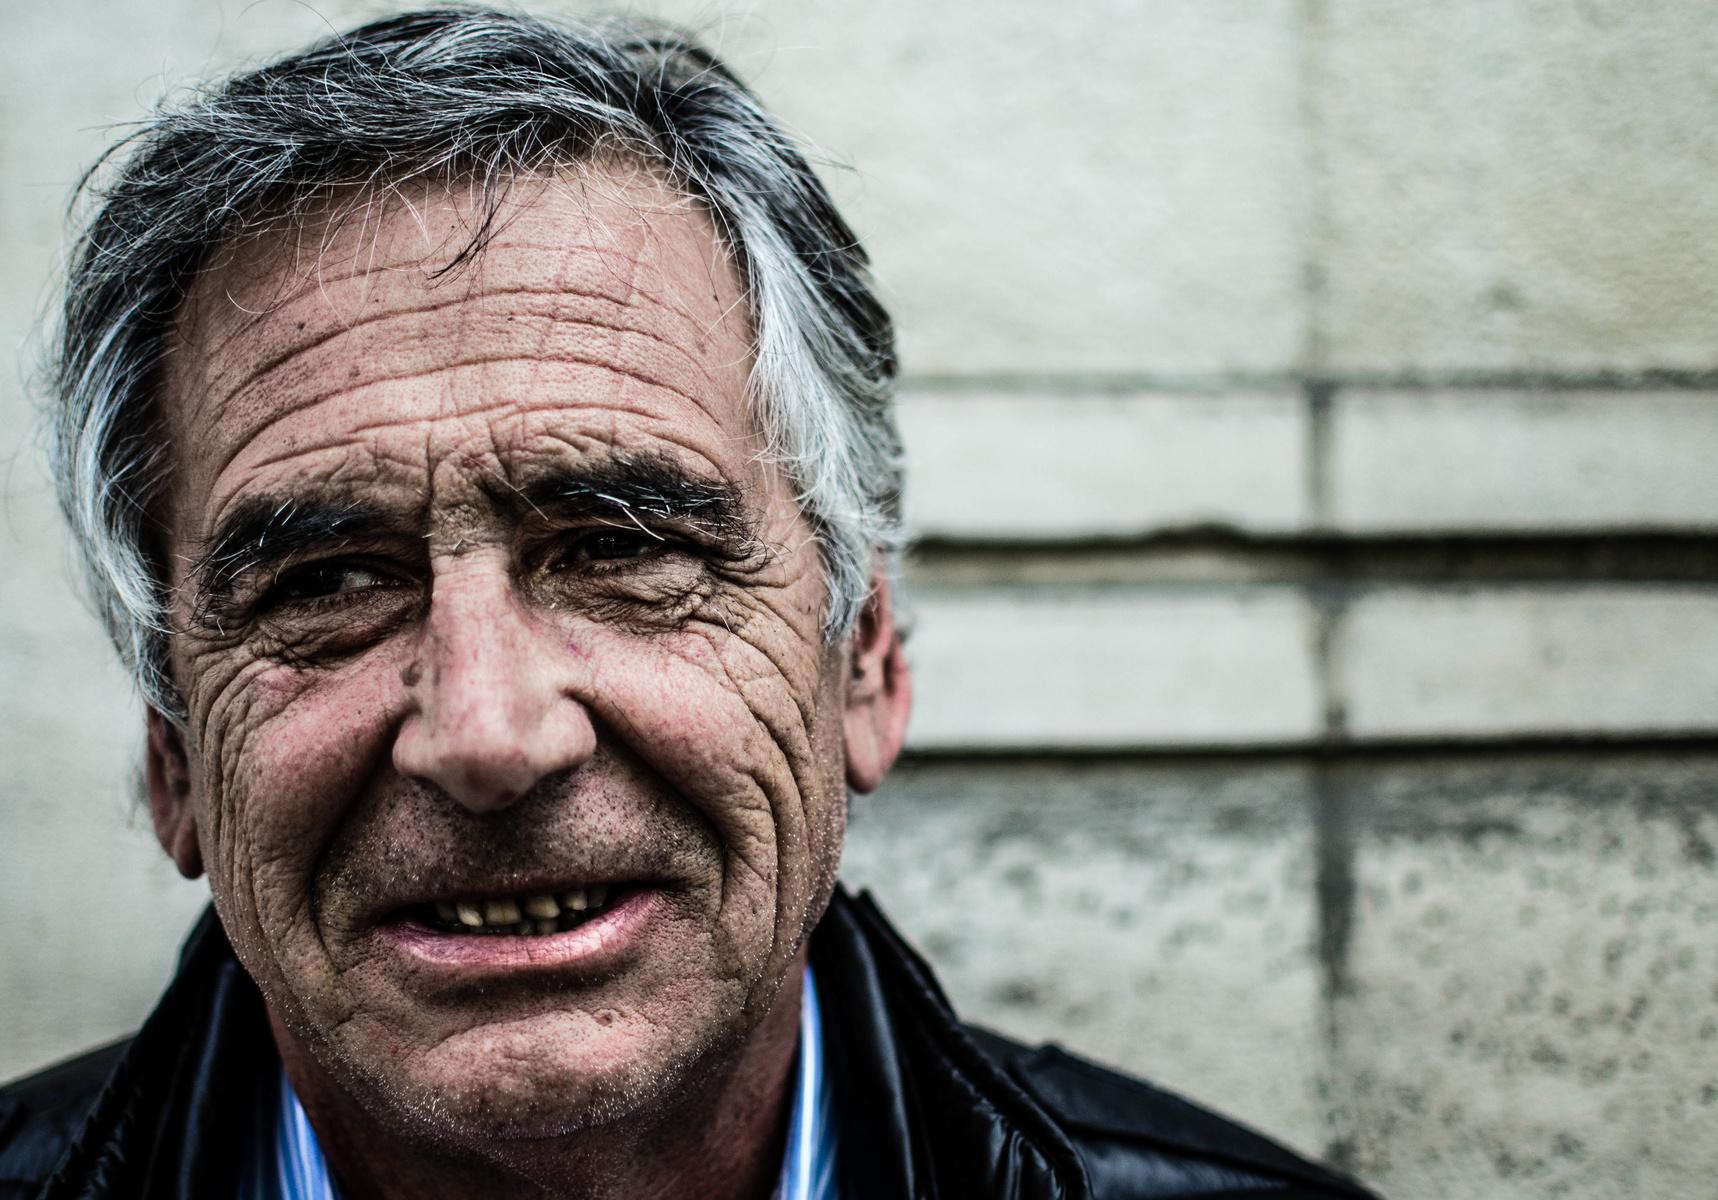 © Philippe Mouchel